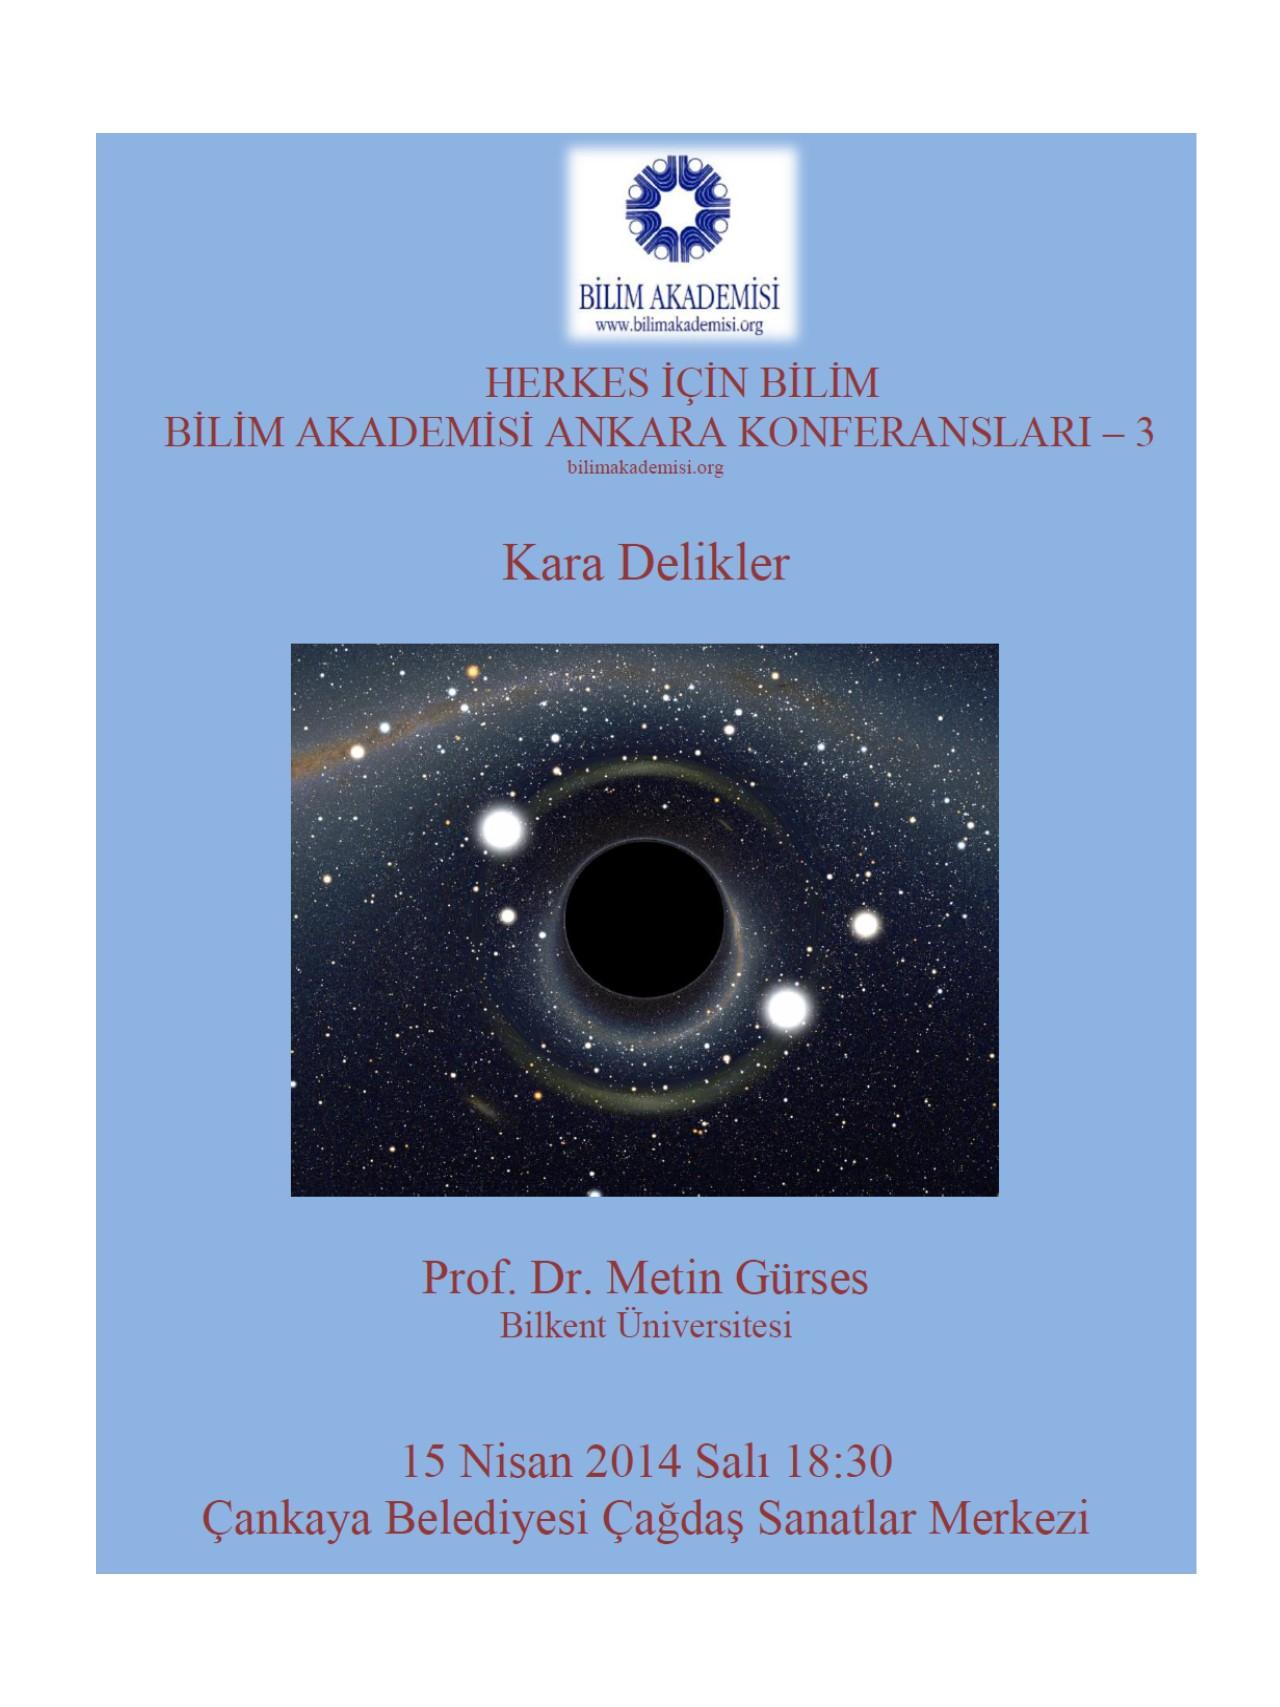 Ankara Konferansları 3